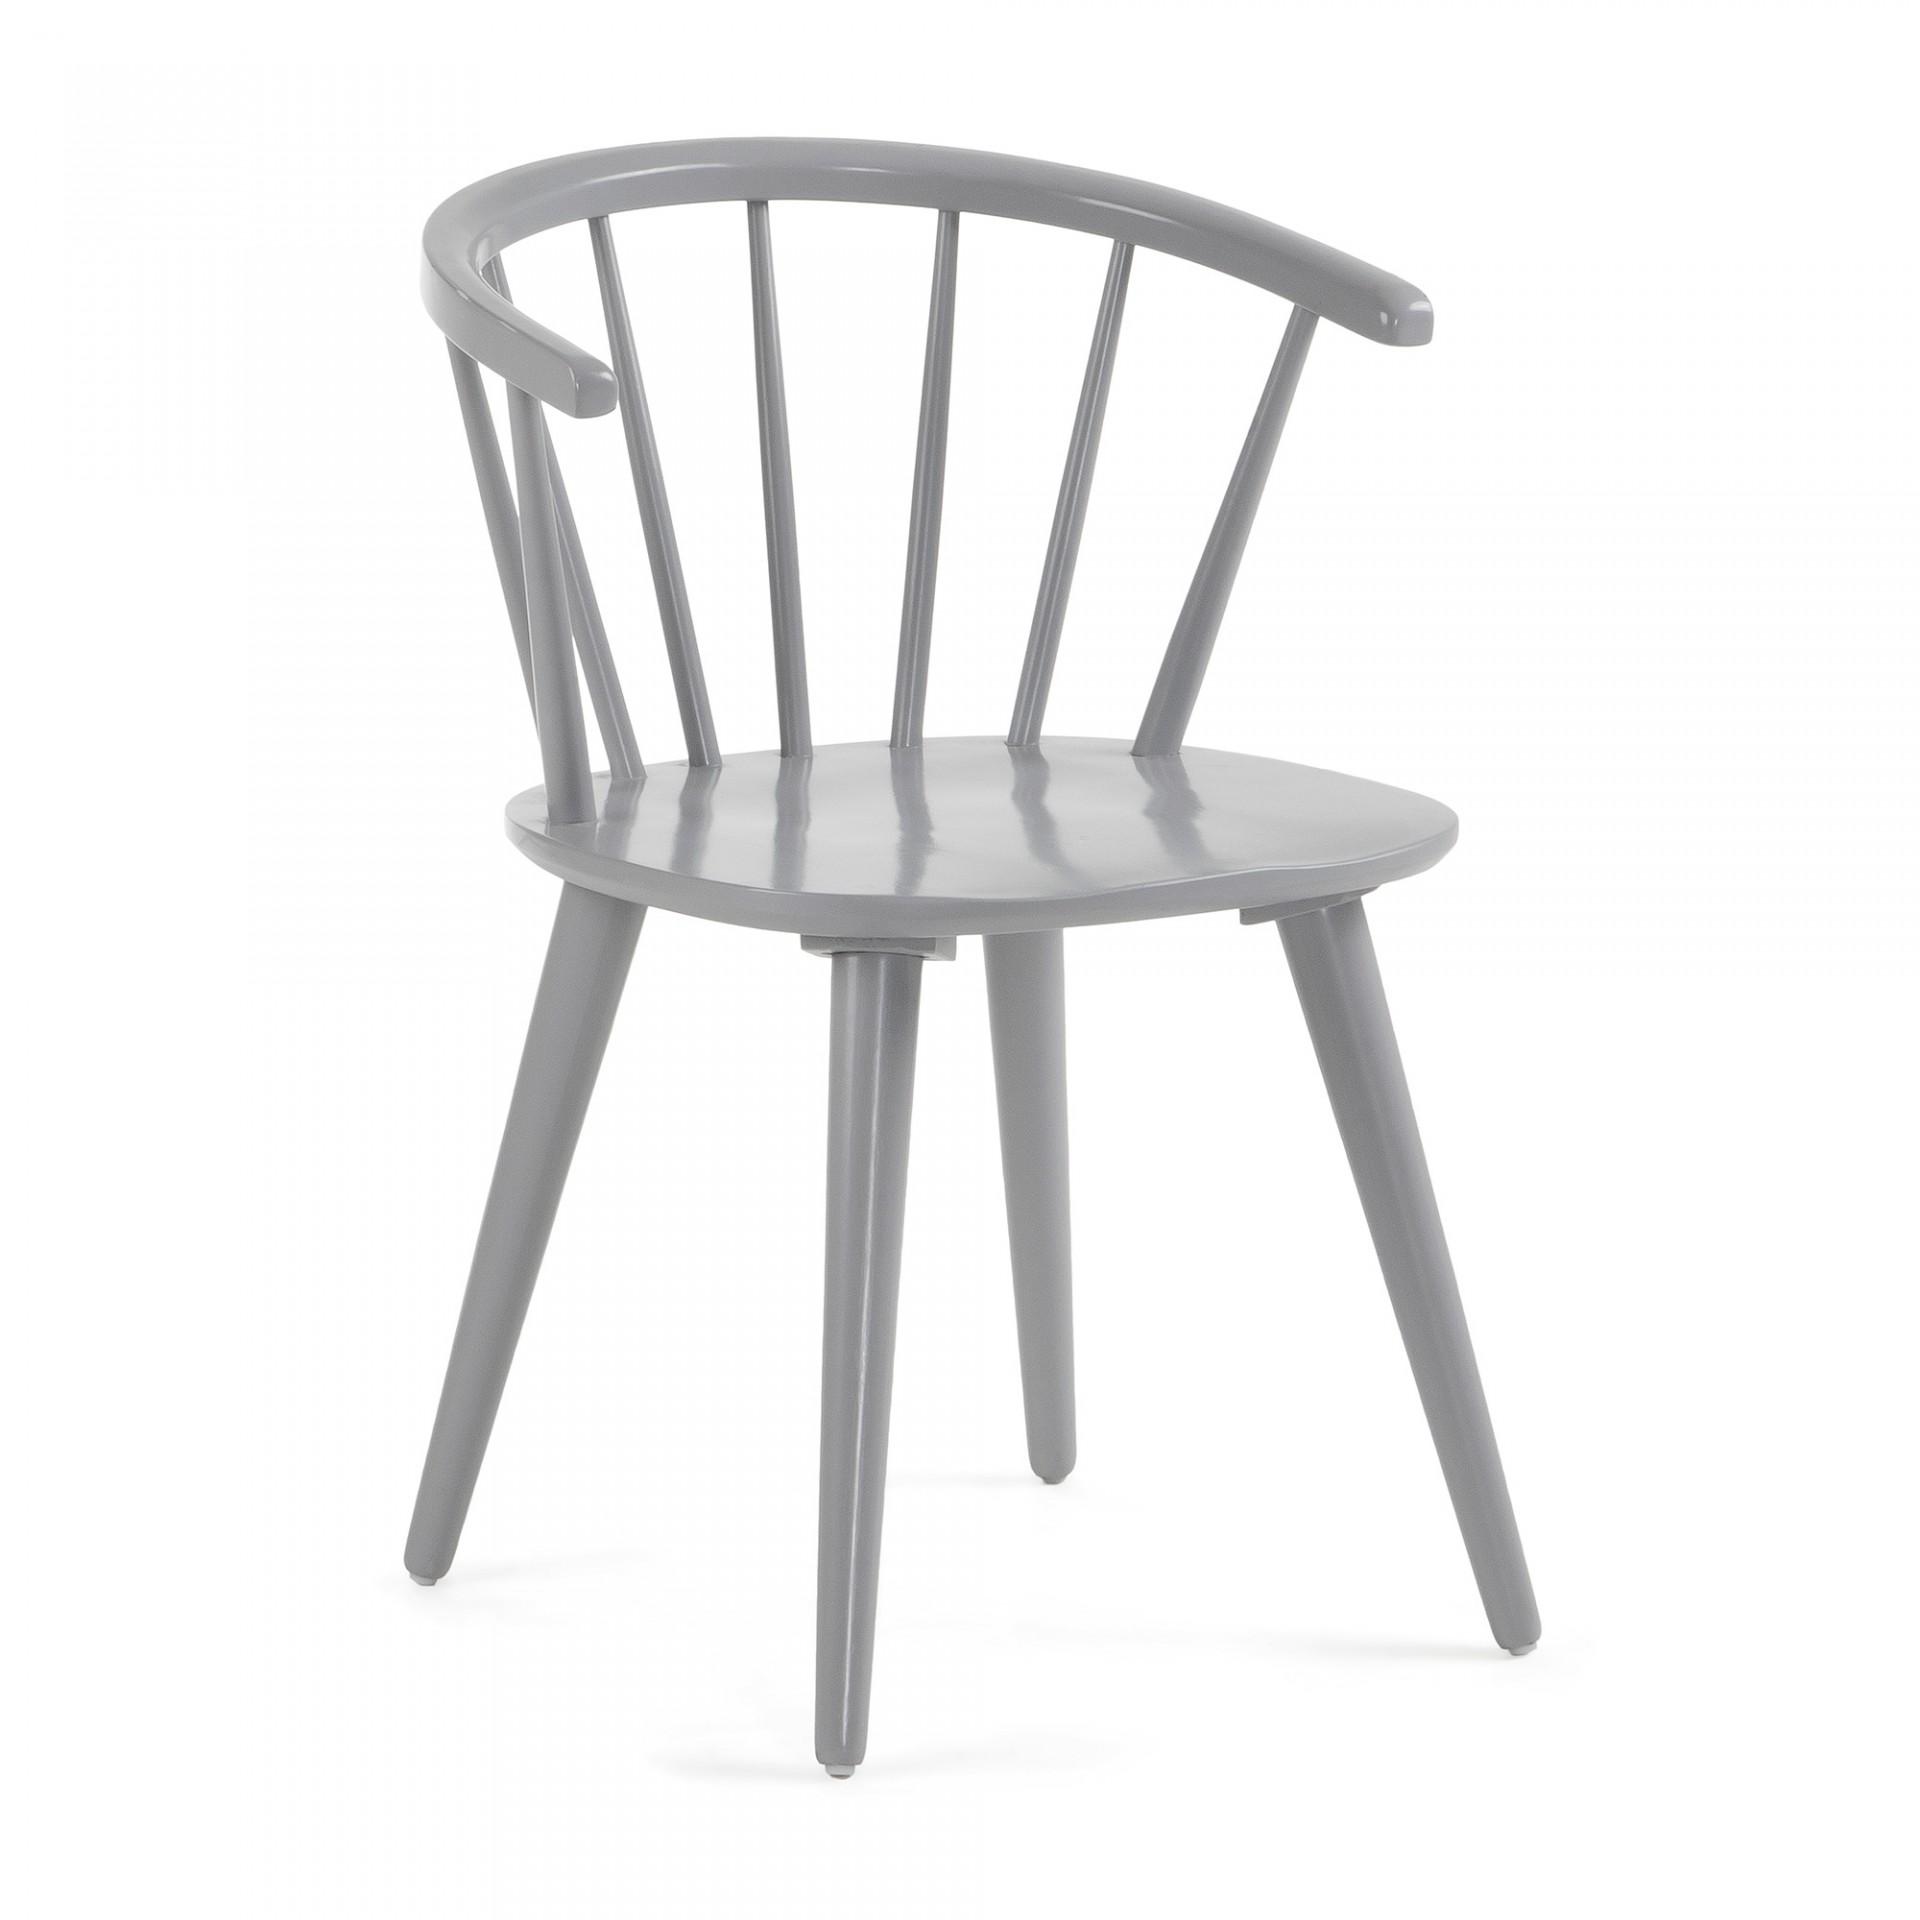 Cadeira Kris, madeira de seringueira, cinza,